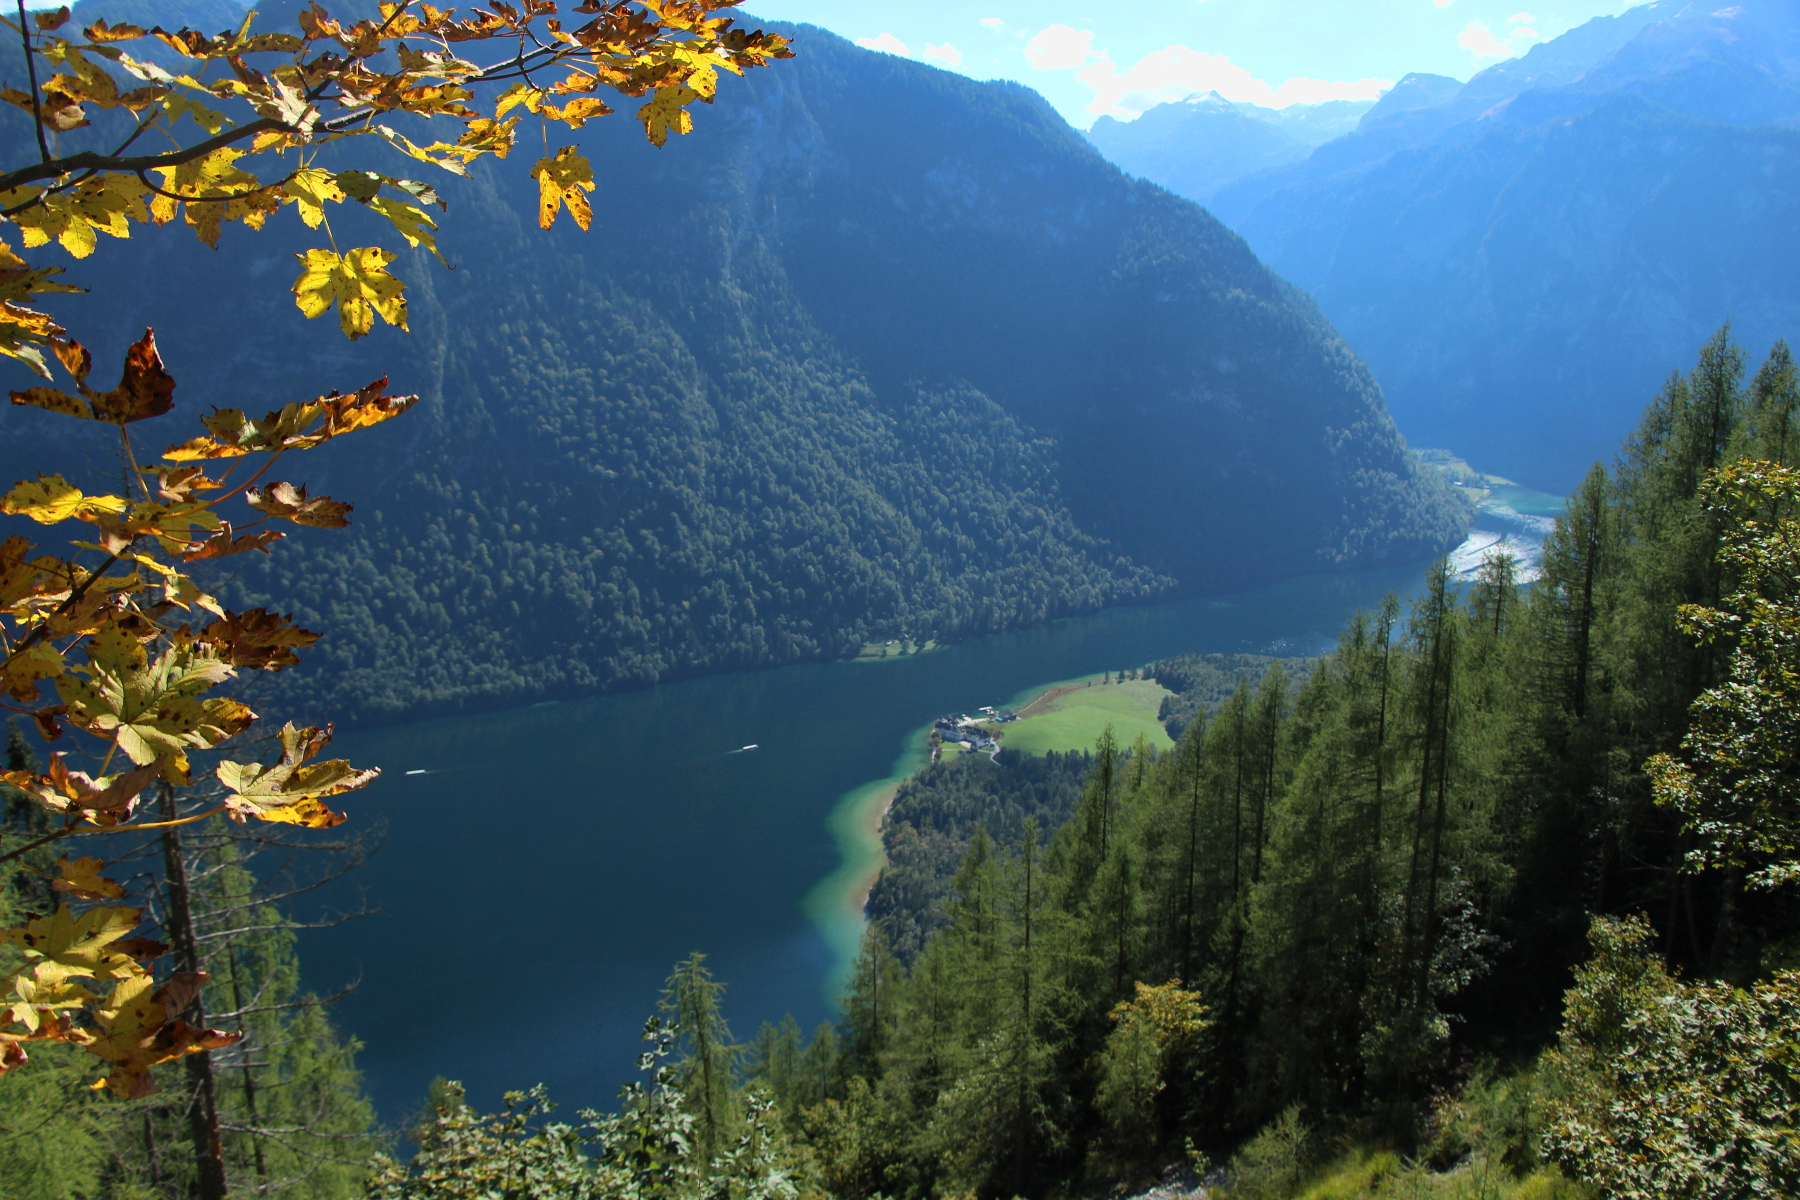 rinnkendlsteig königsee